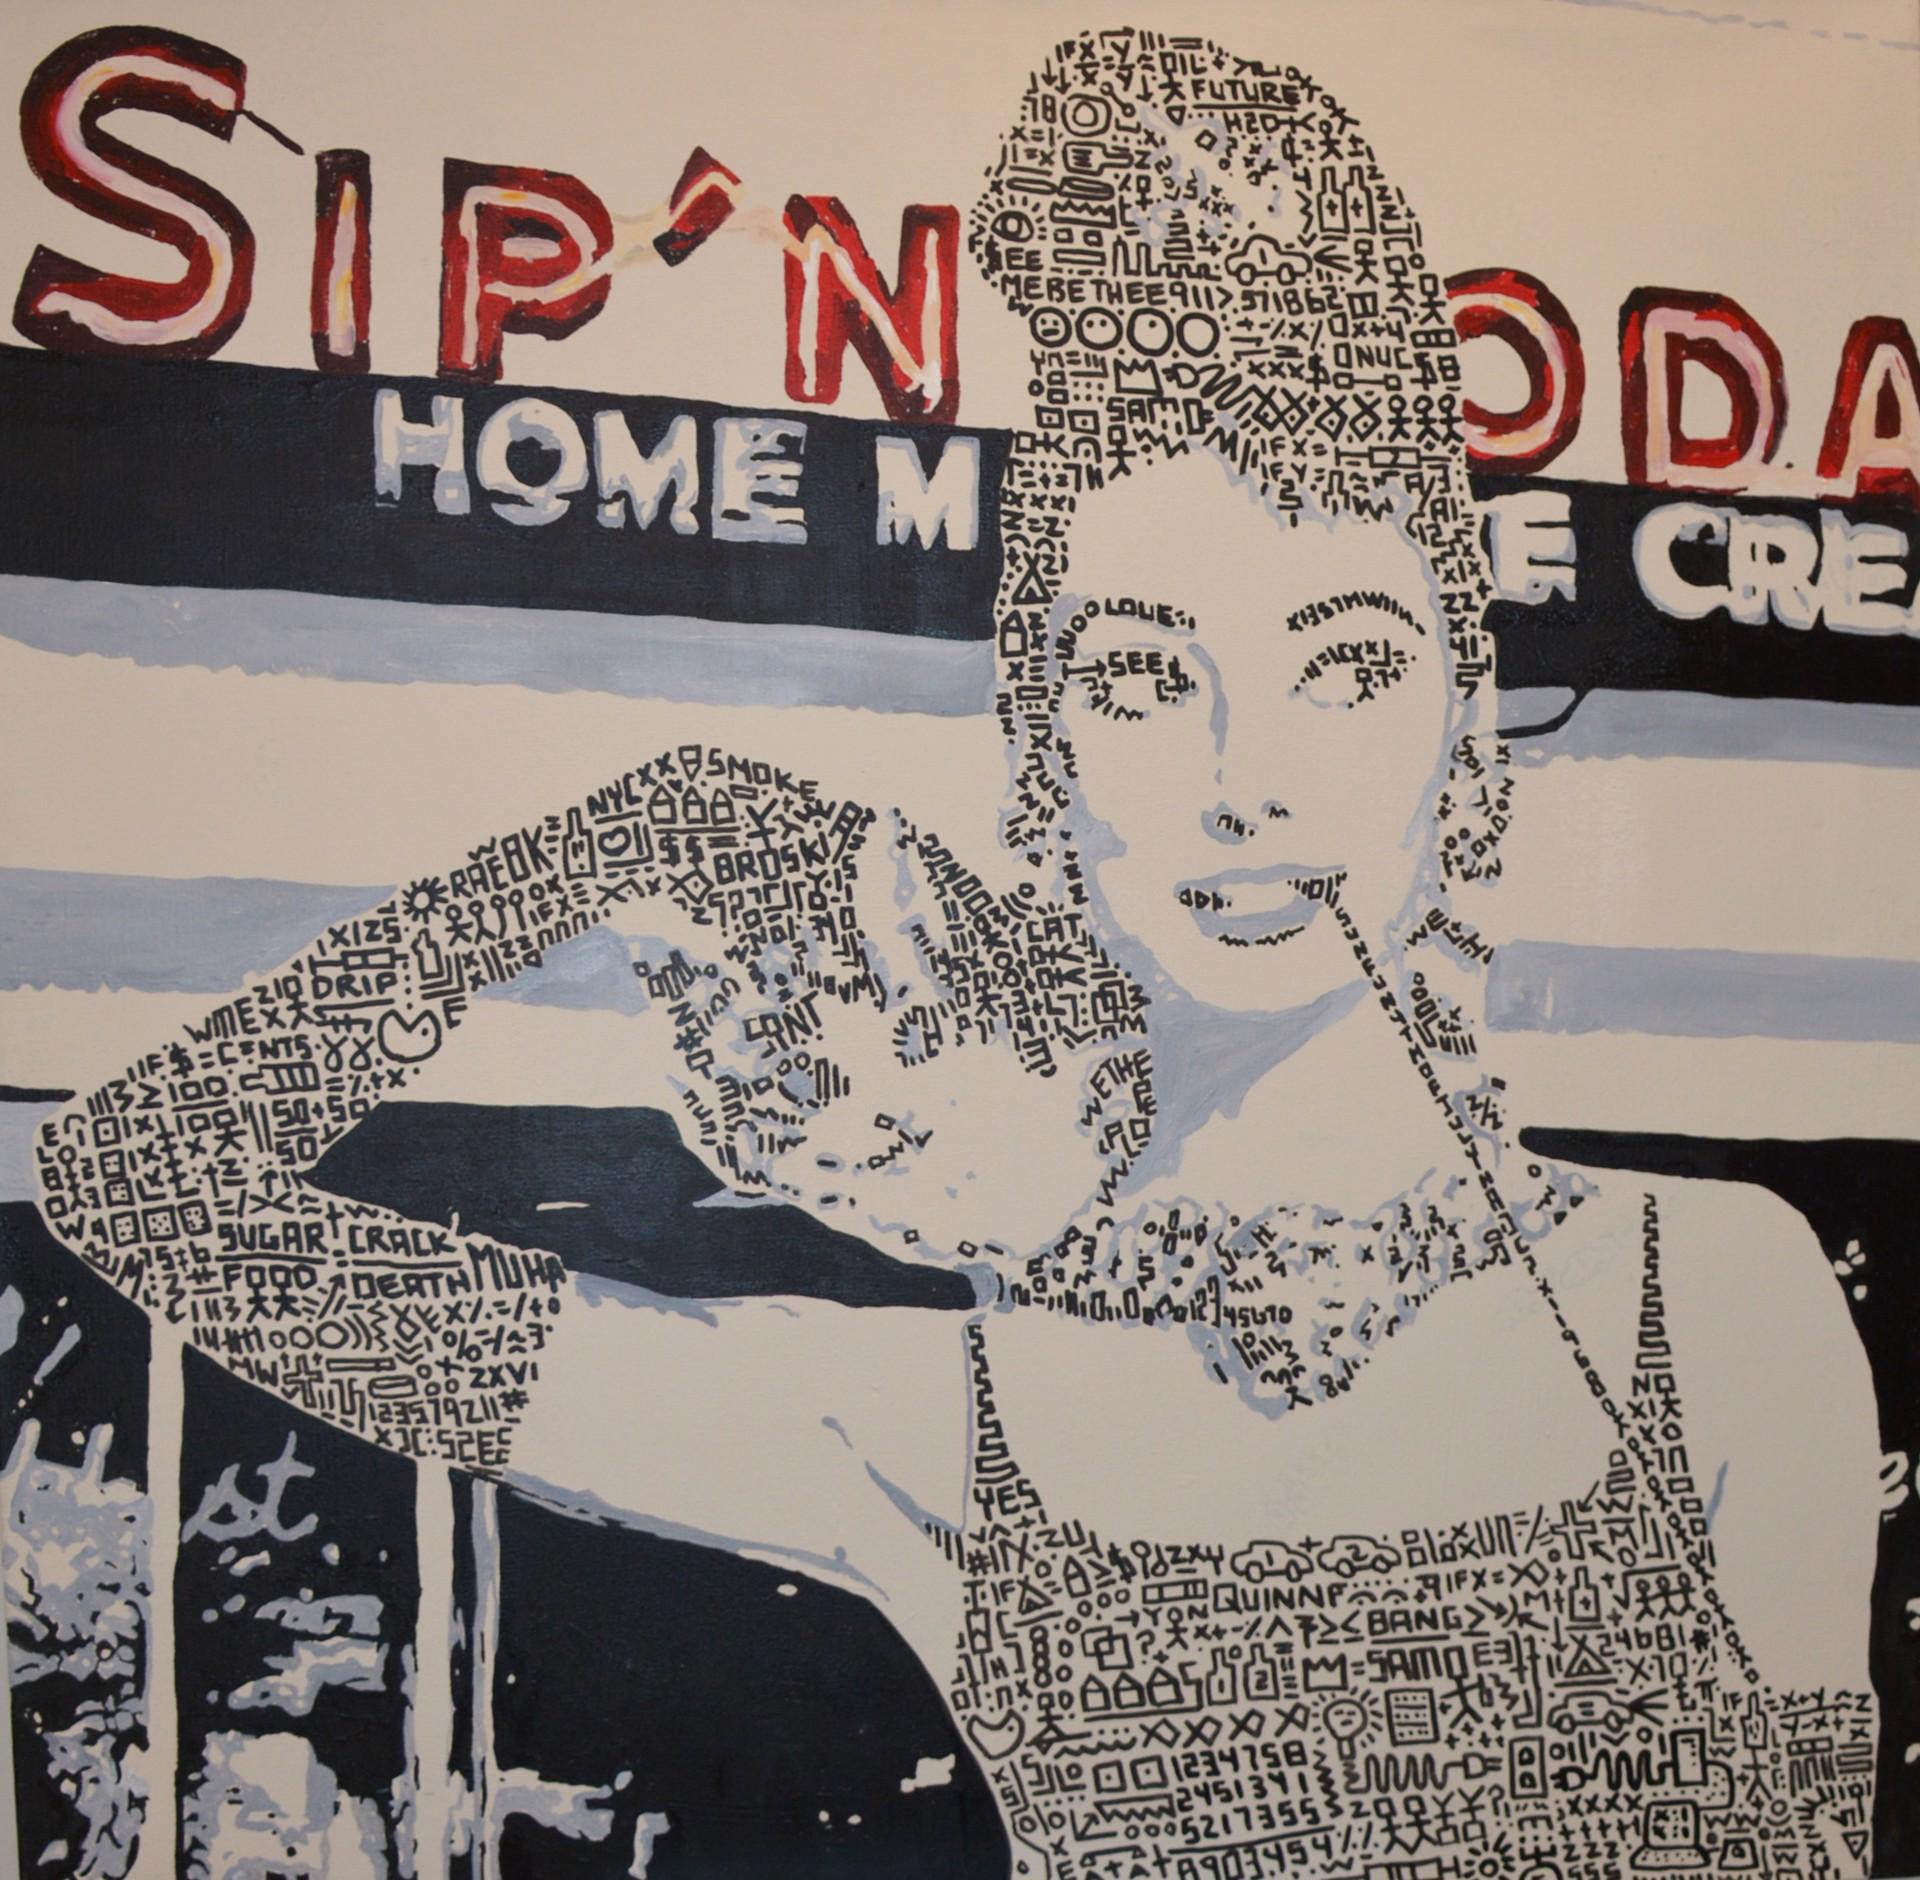 Audrey at Sips by Jason Poremba